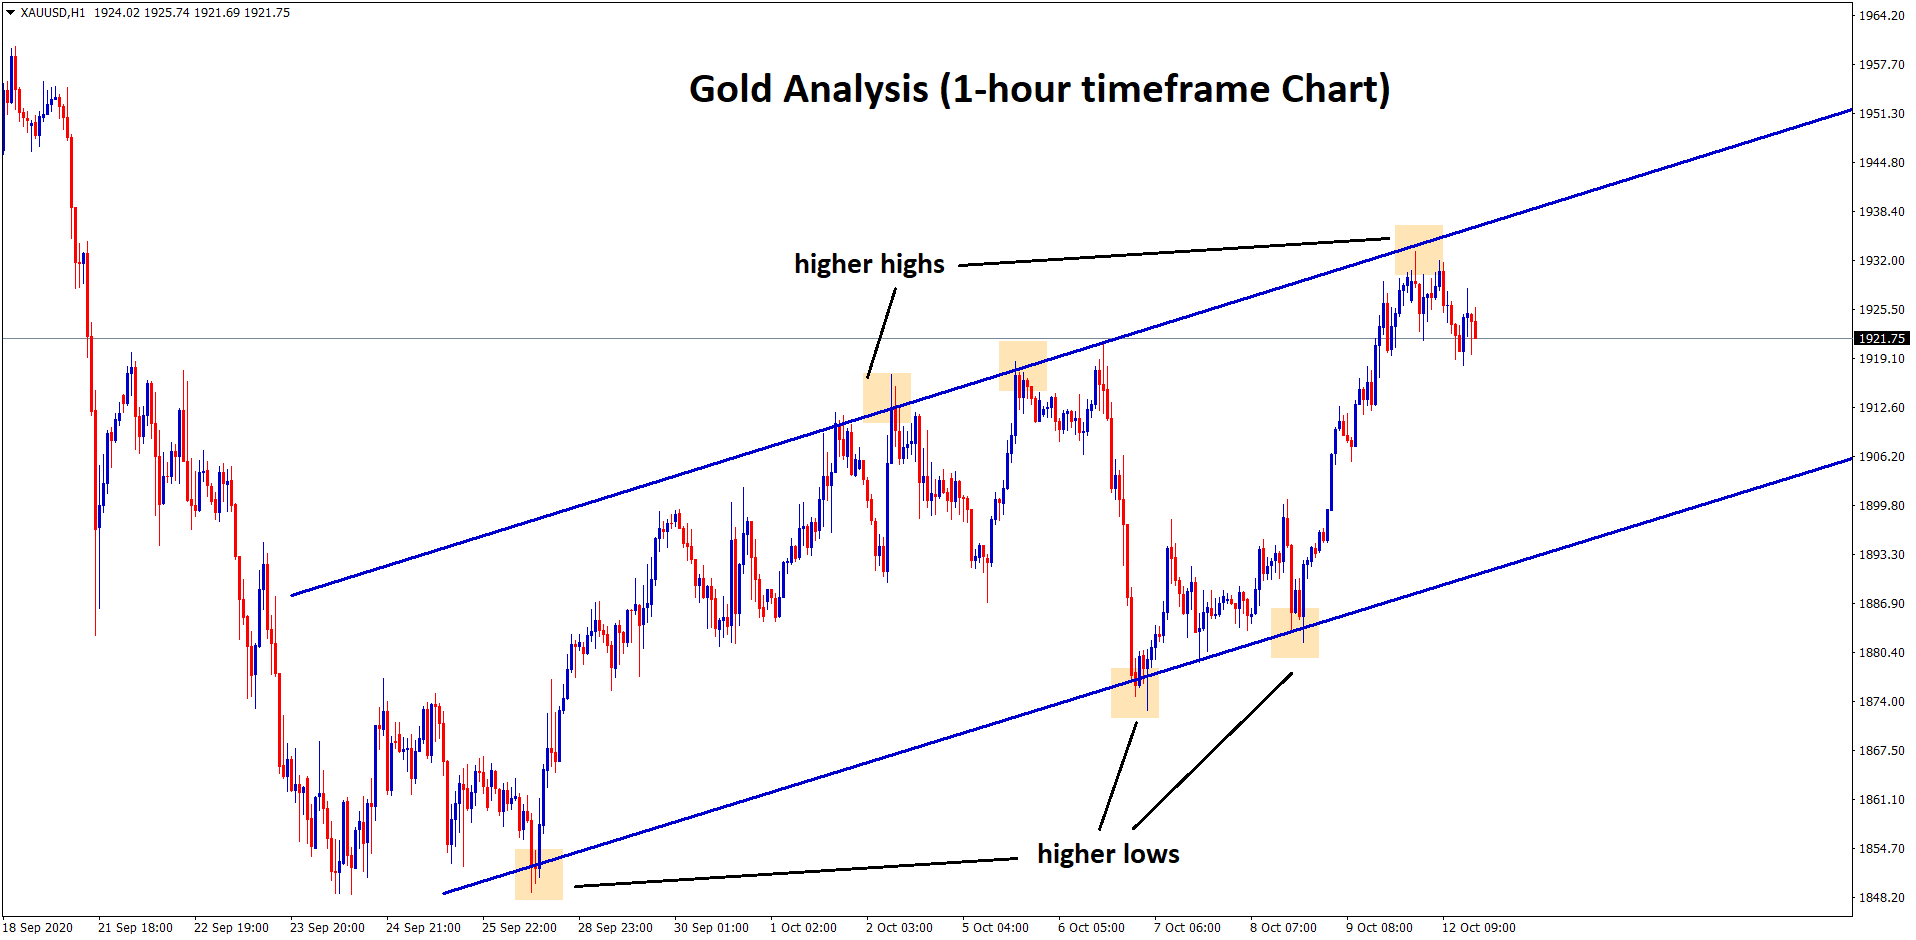 gold reach the higher high in 1hr 1